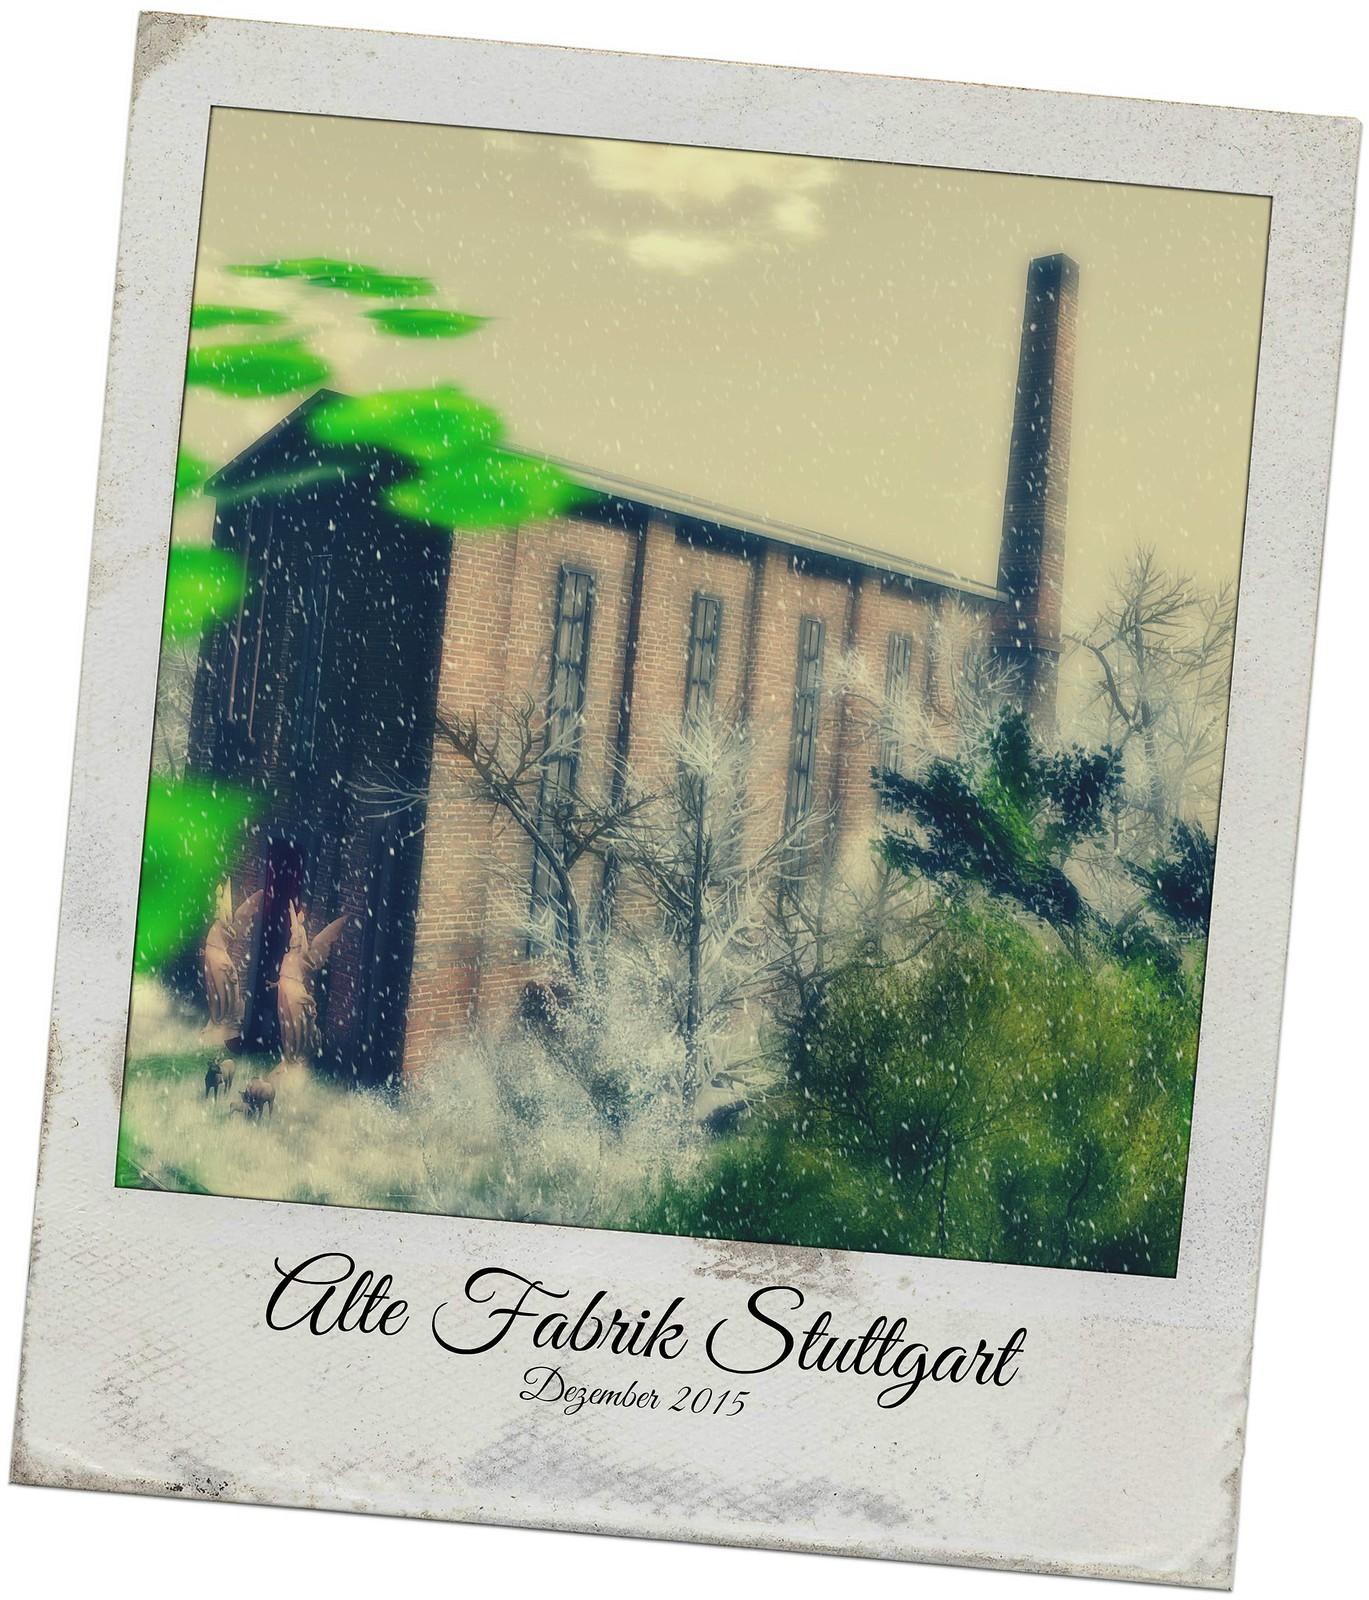 Alte Fabrik Stuttgart